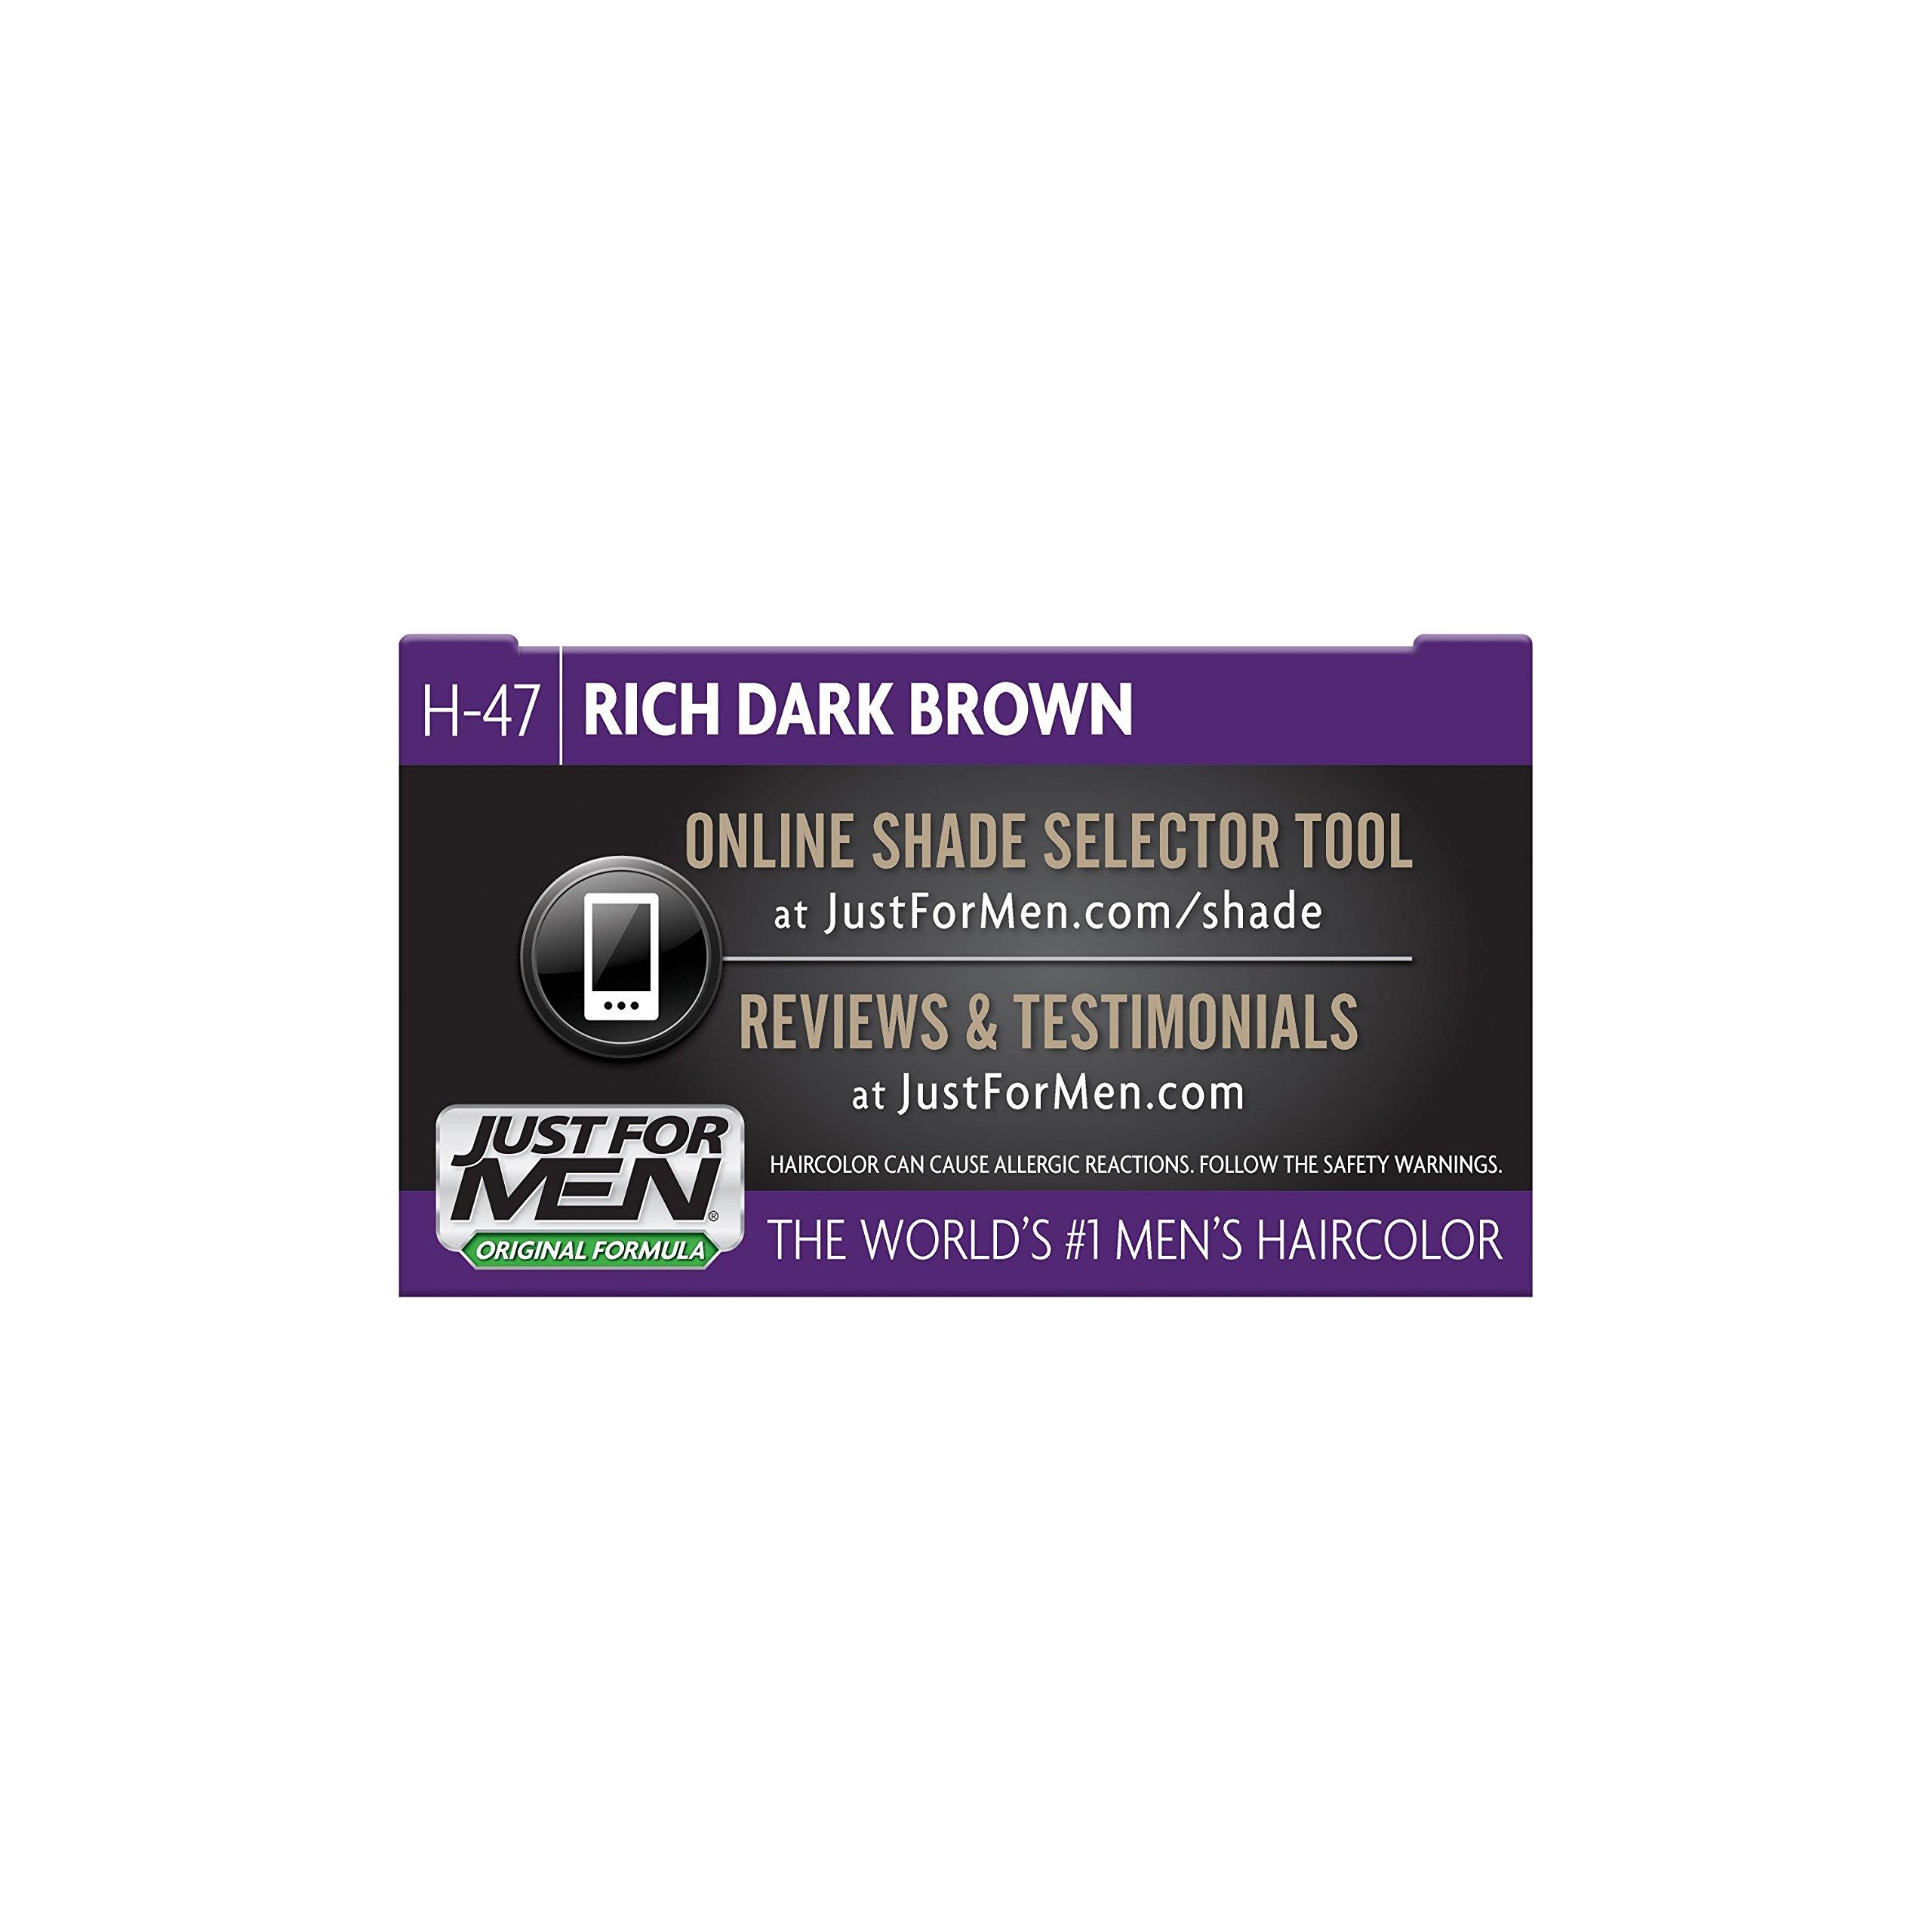 Just For Men Original Formula Men's Hair Color, Rich Dark Brown, (Pack of 12) by Just for Men (Image #7)